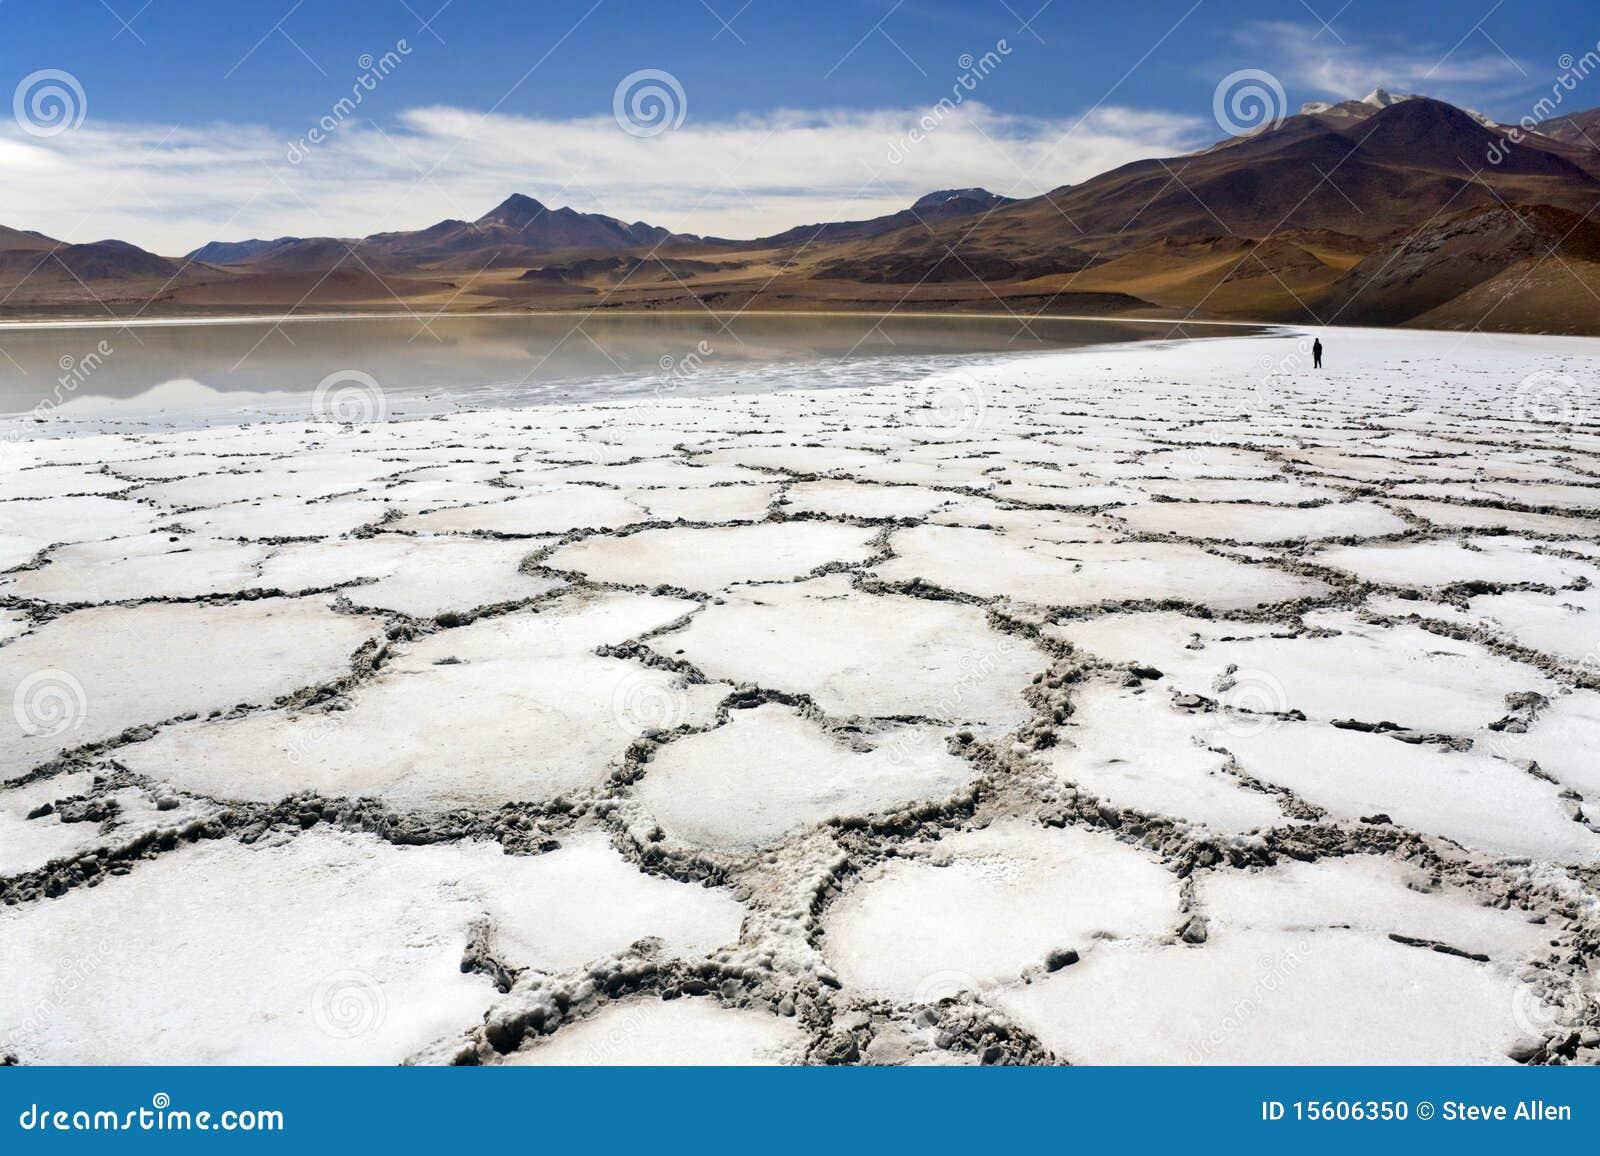 Download Atacama Desert in Chile stock photo. Image of minerals - 15606350